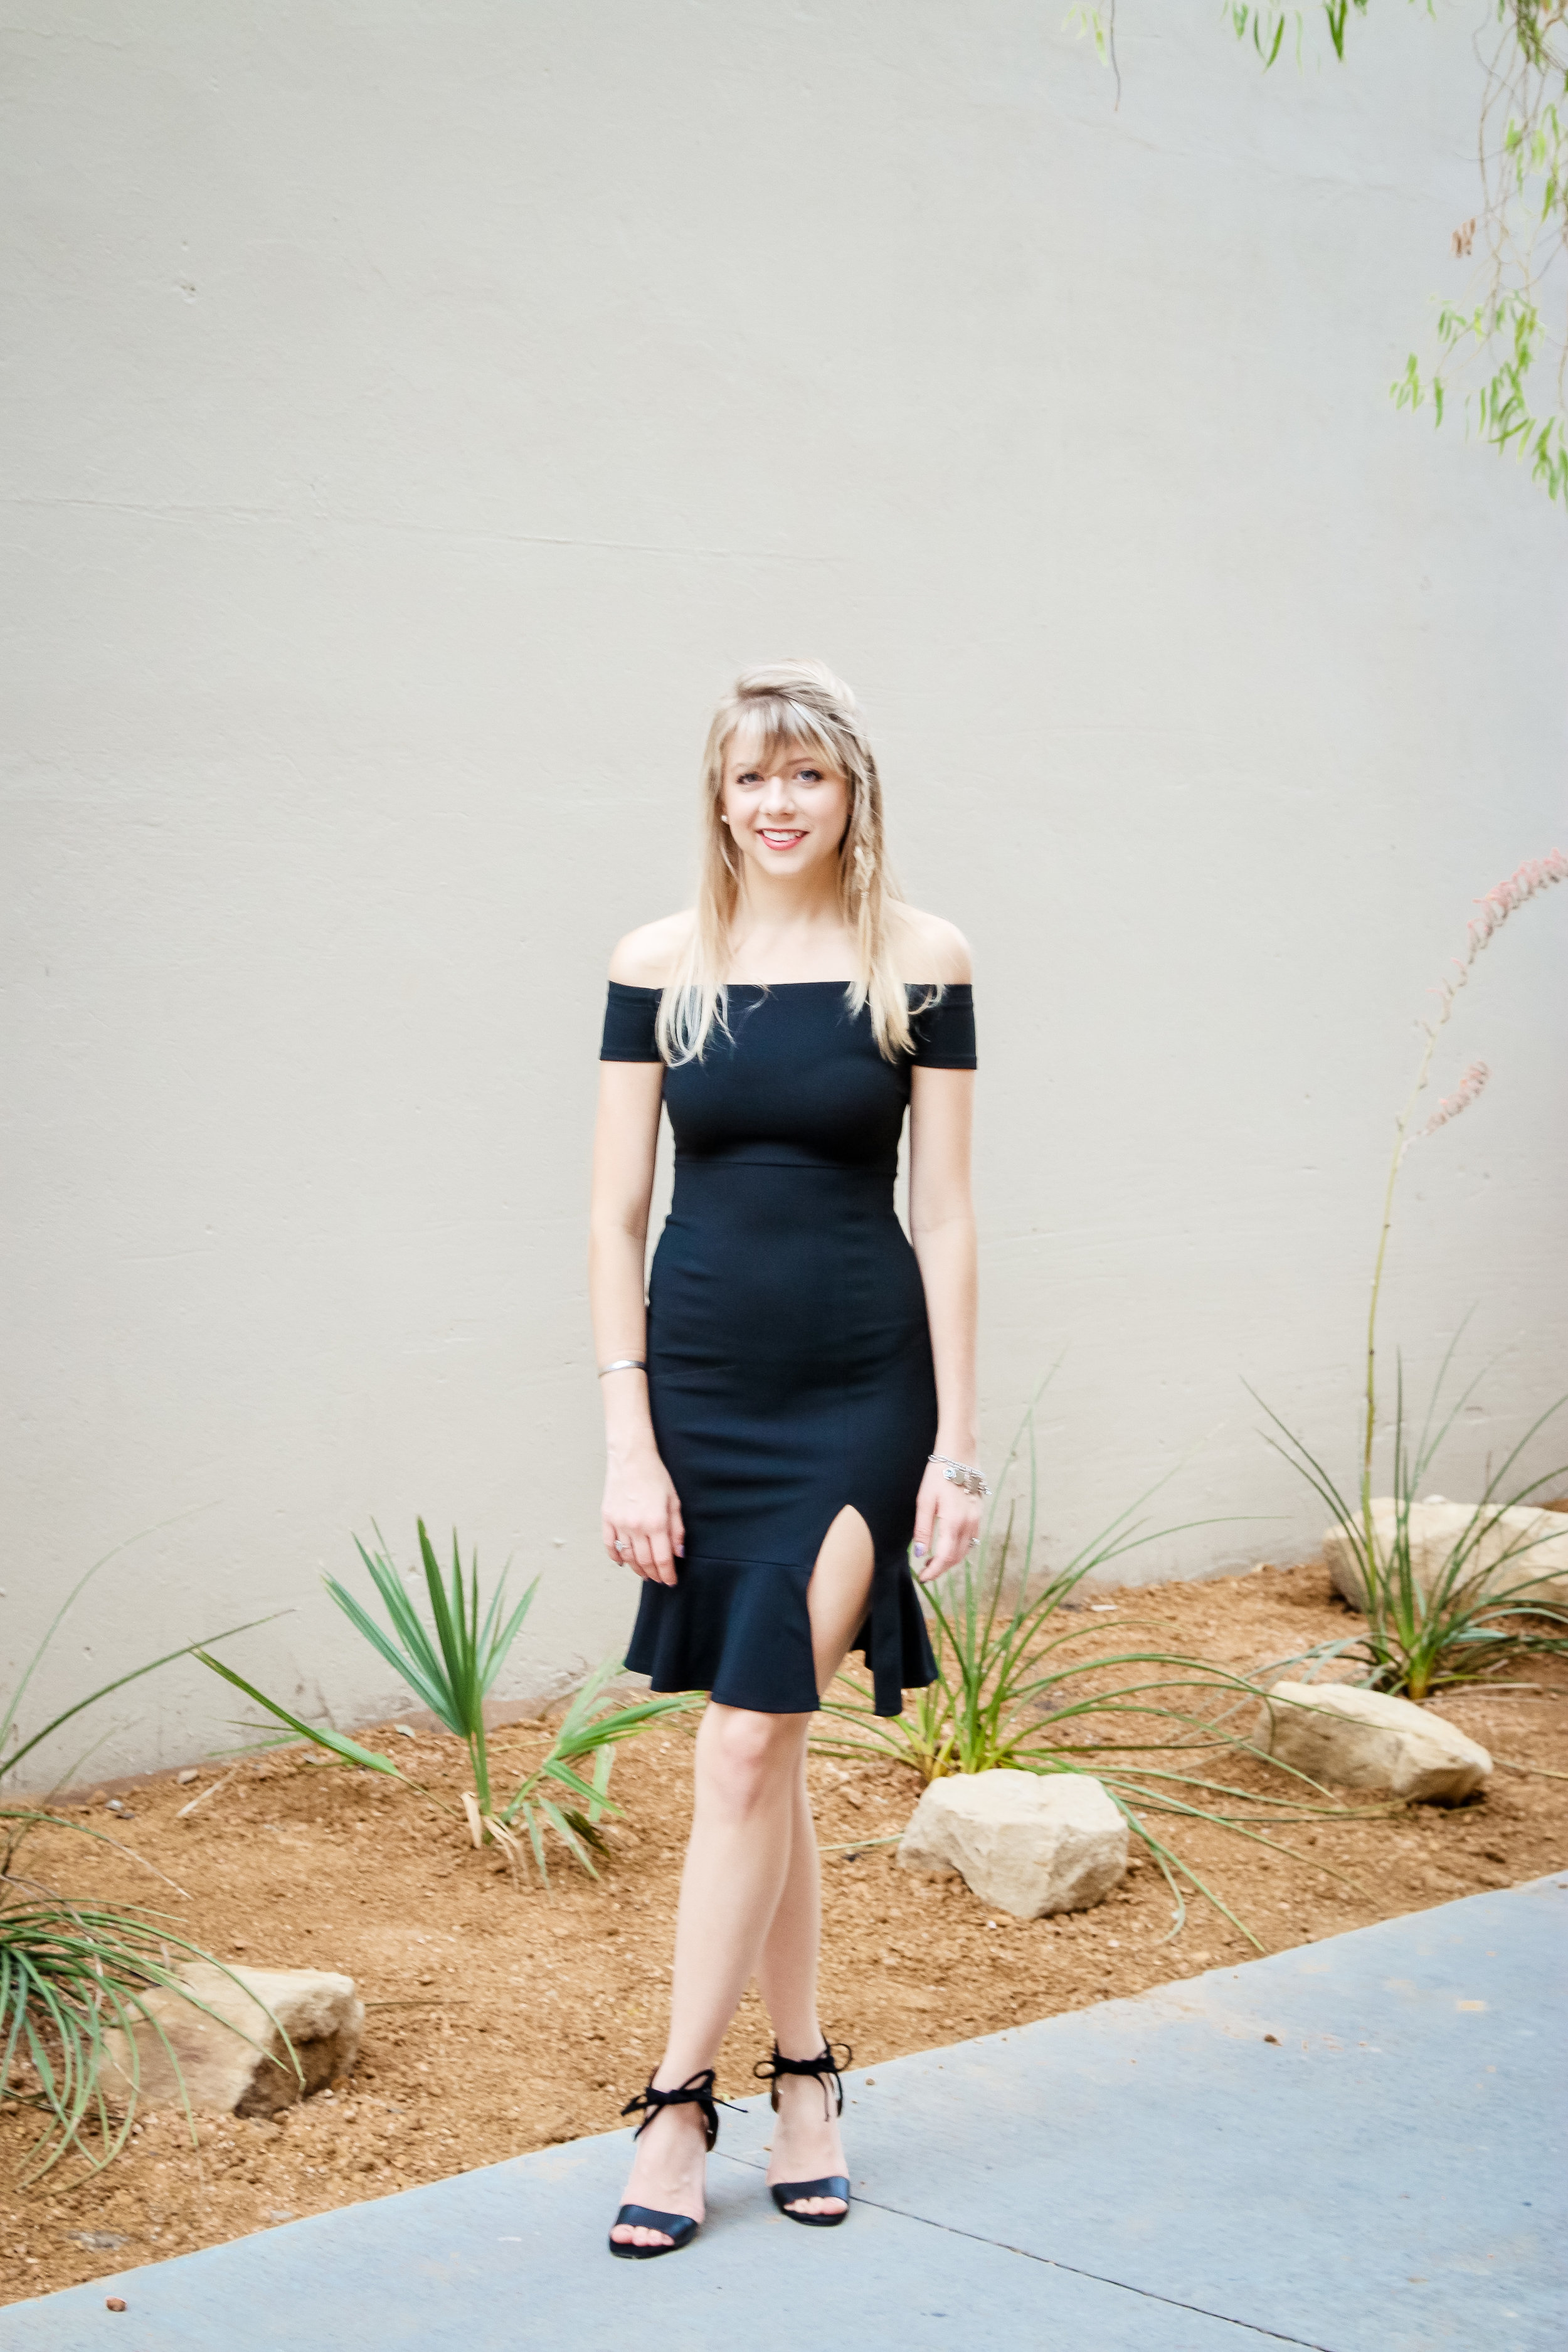 Houston Fashion Blogger - Wander Dust - Little Black Dress - Shop PinkBlush (3).jpg